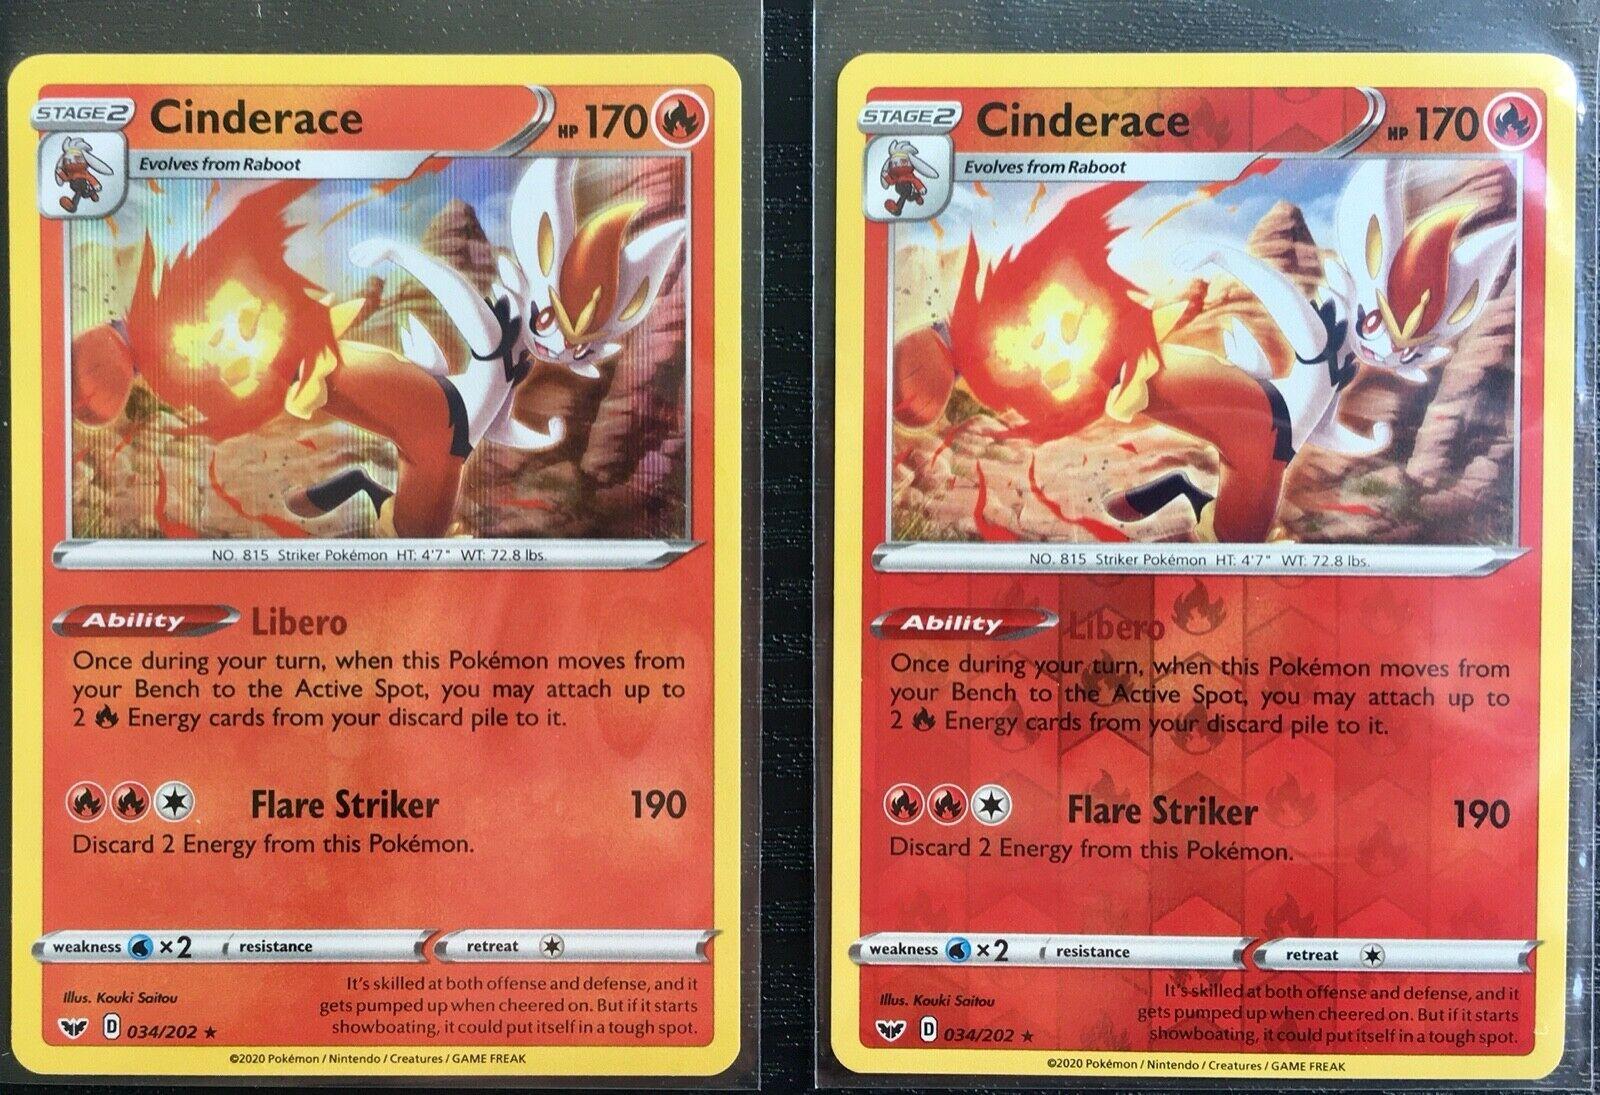 2020 Cinderace 034//202 Rare Holo Sword /& Shield Set Pokemon Card - NM